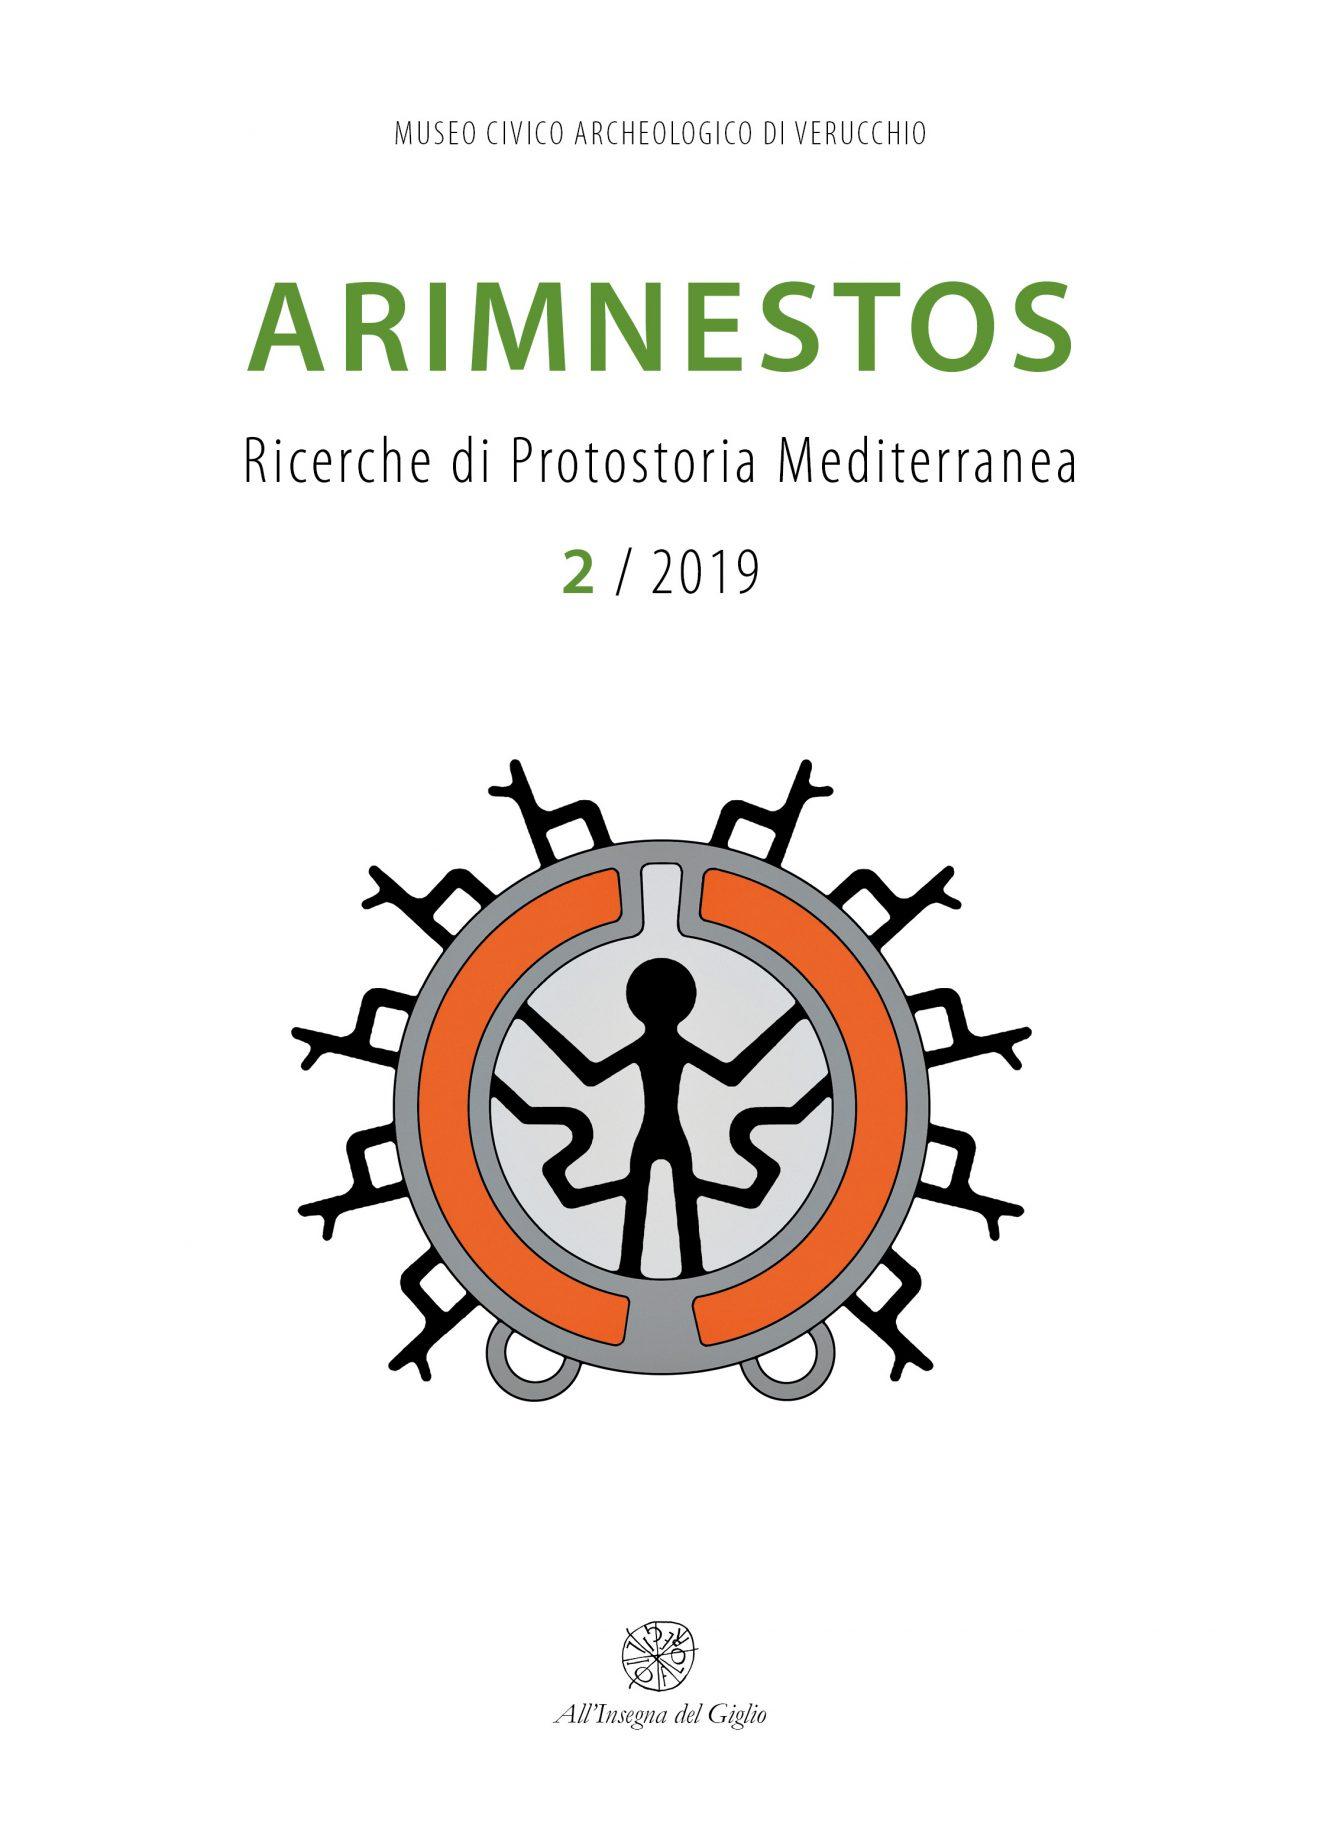 ARIMNESTOS. Ricerche di Protostoria Mediterranea, 2/2019